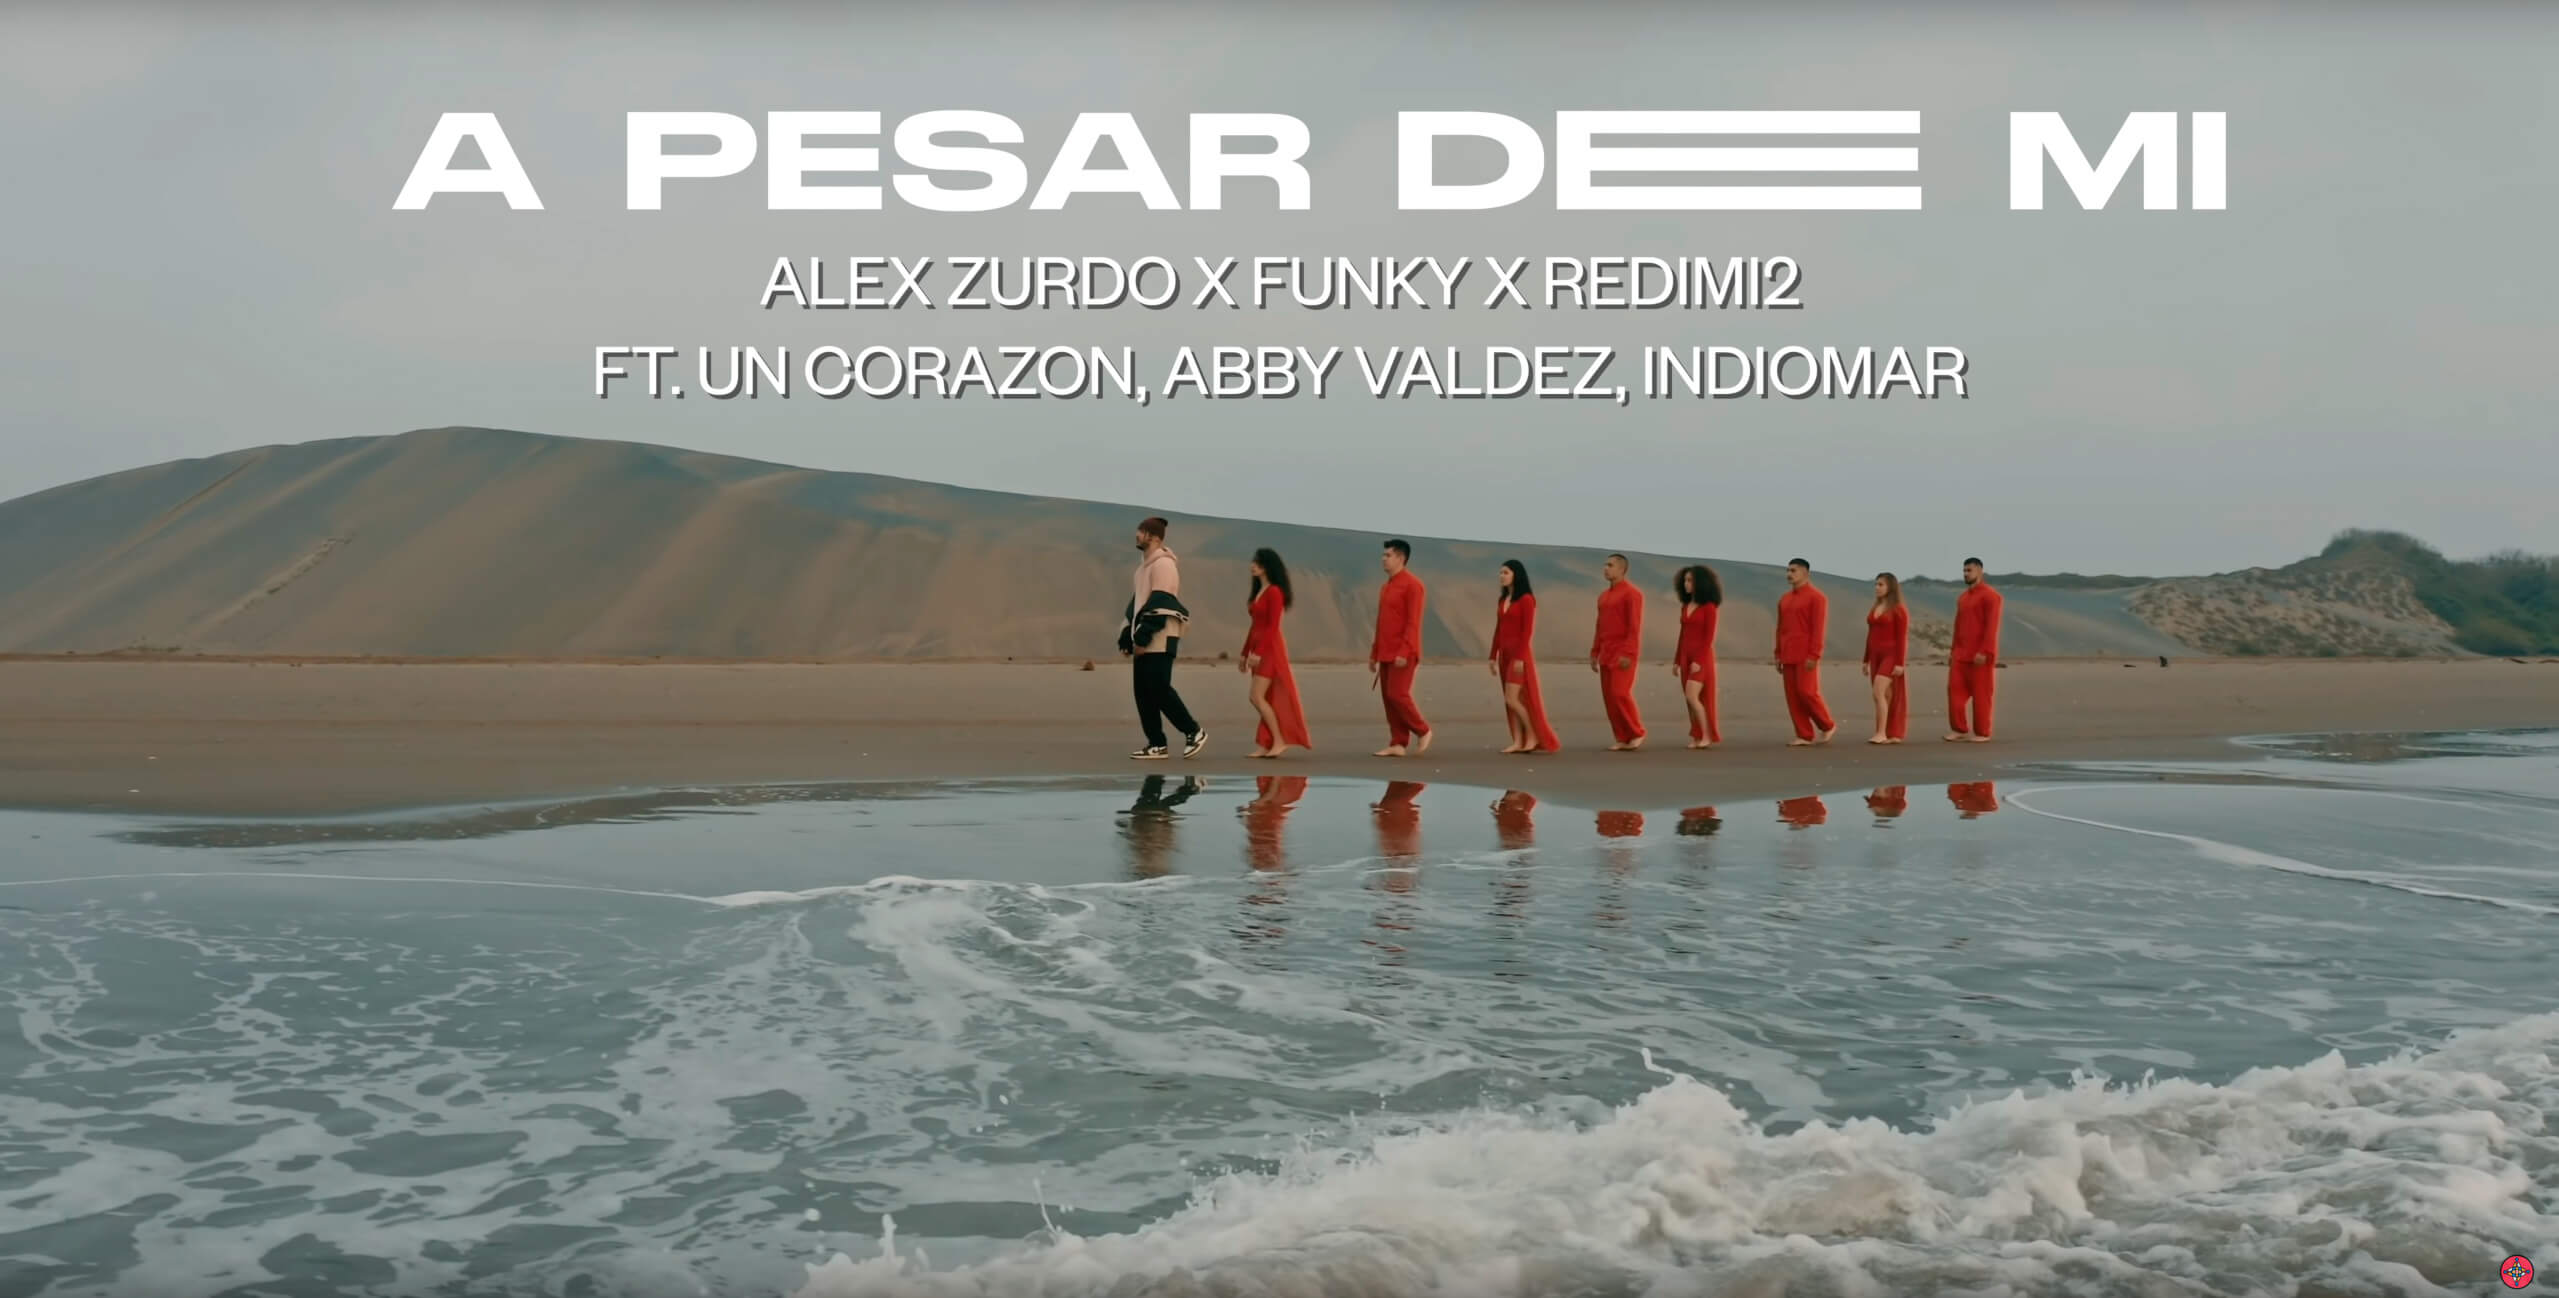 A Pesar De Mí Alex Zurdo, Redimi2, Funky Un Corazón, Indiomar, Abby Valdez